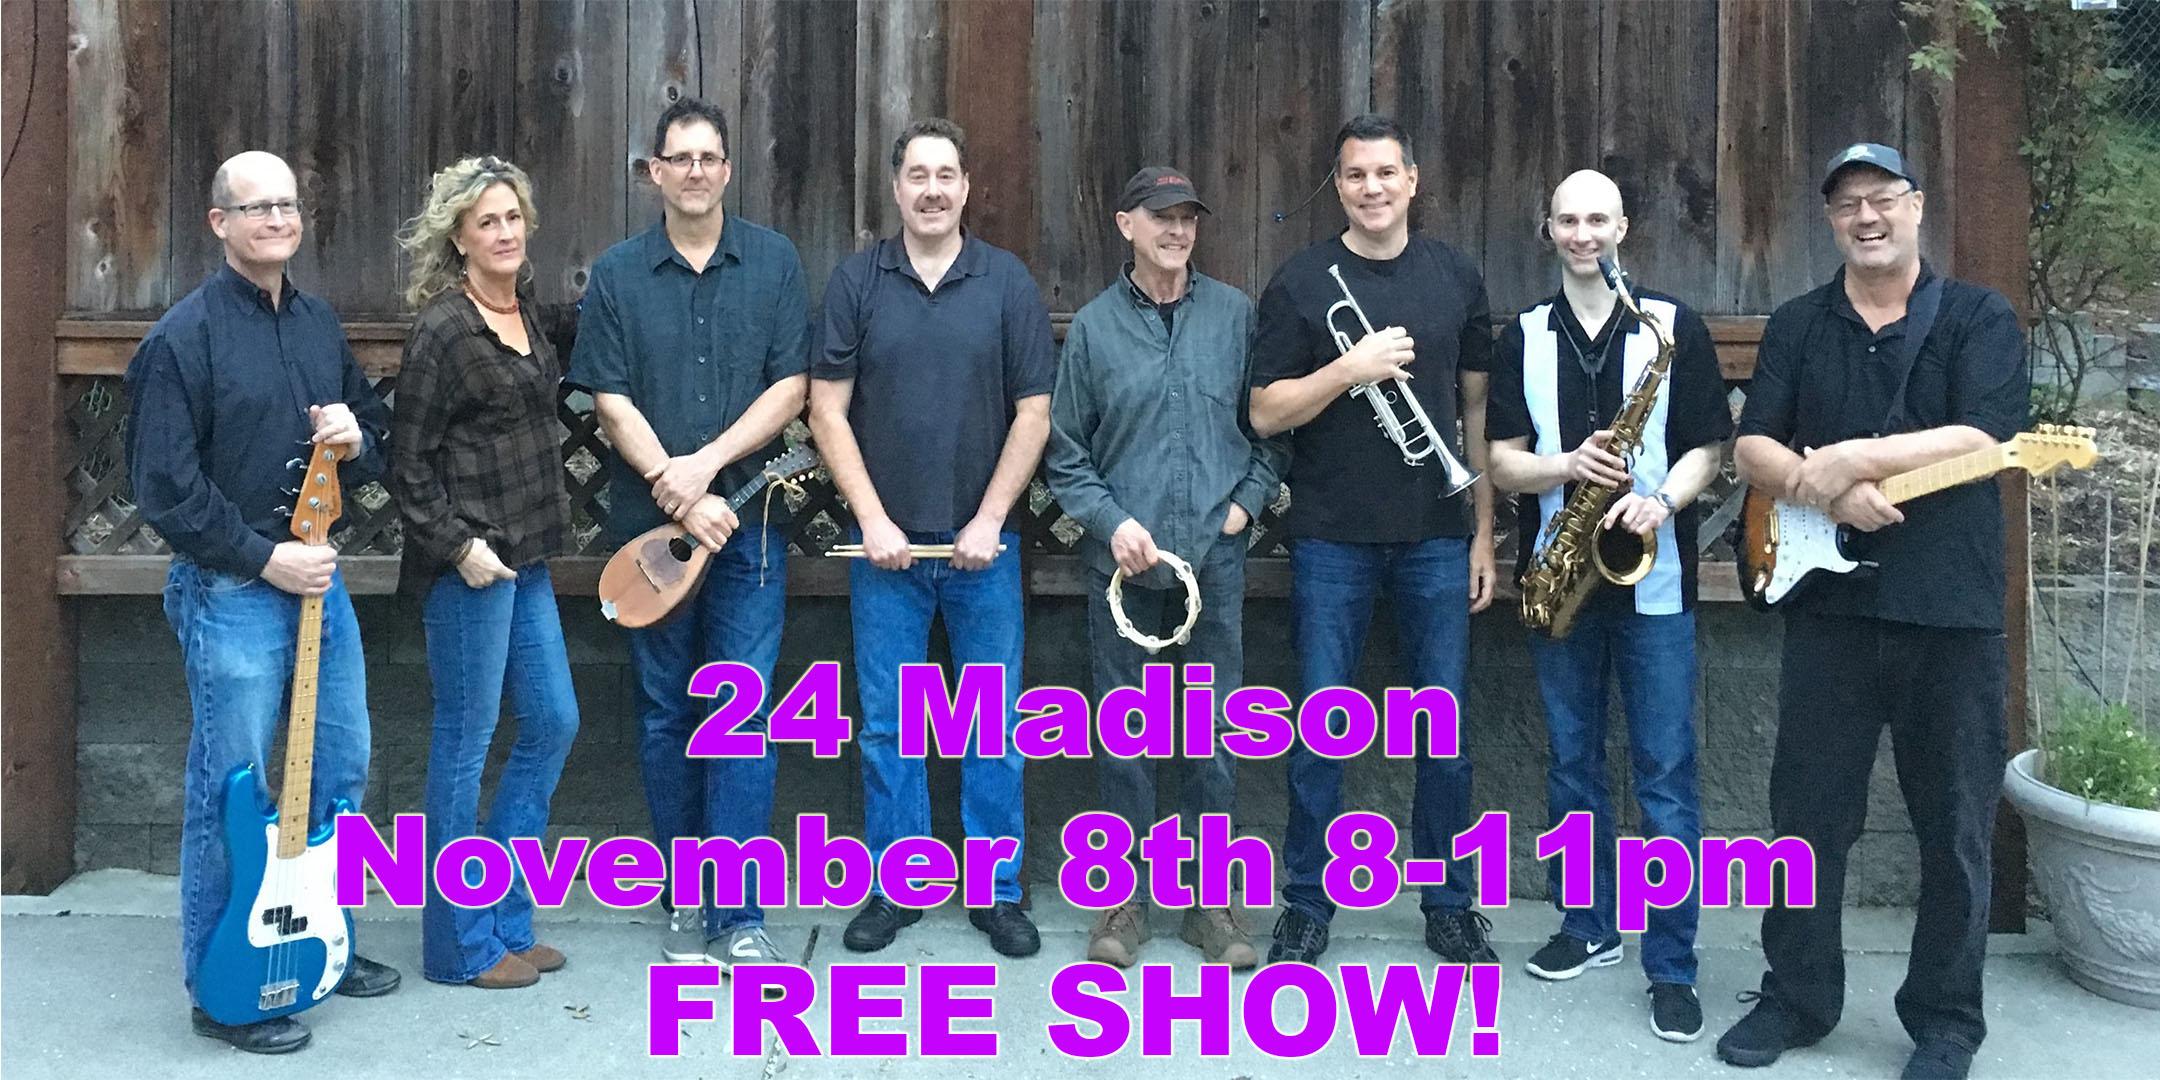 24 Madison